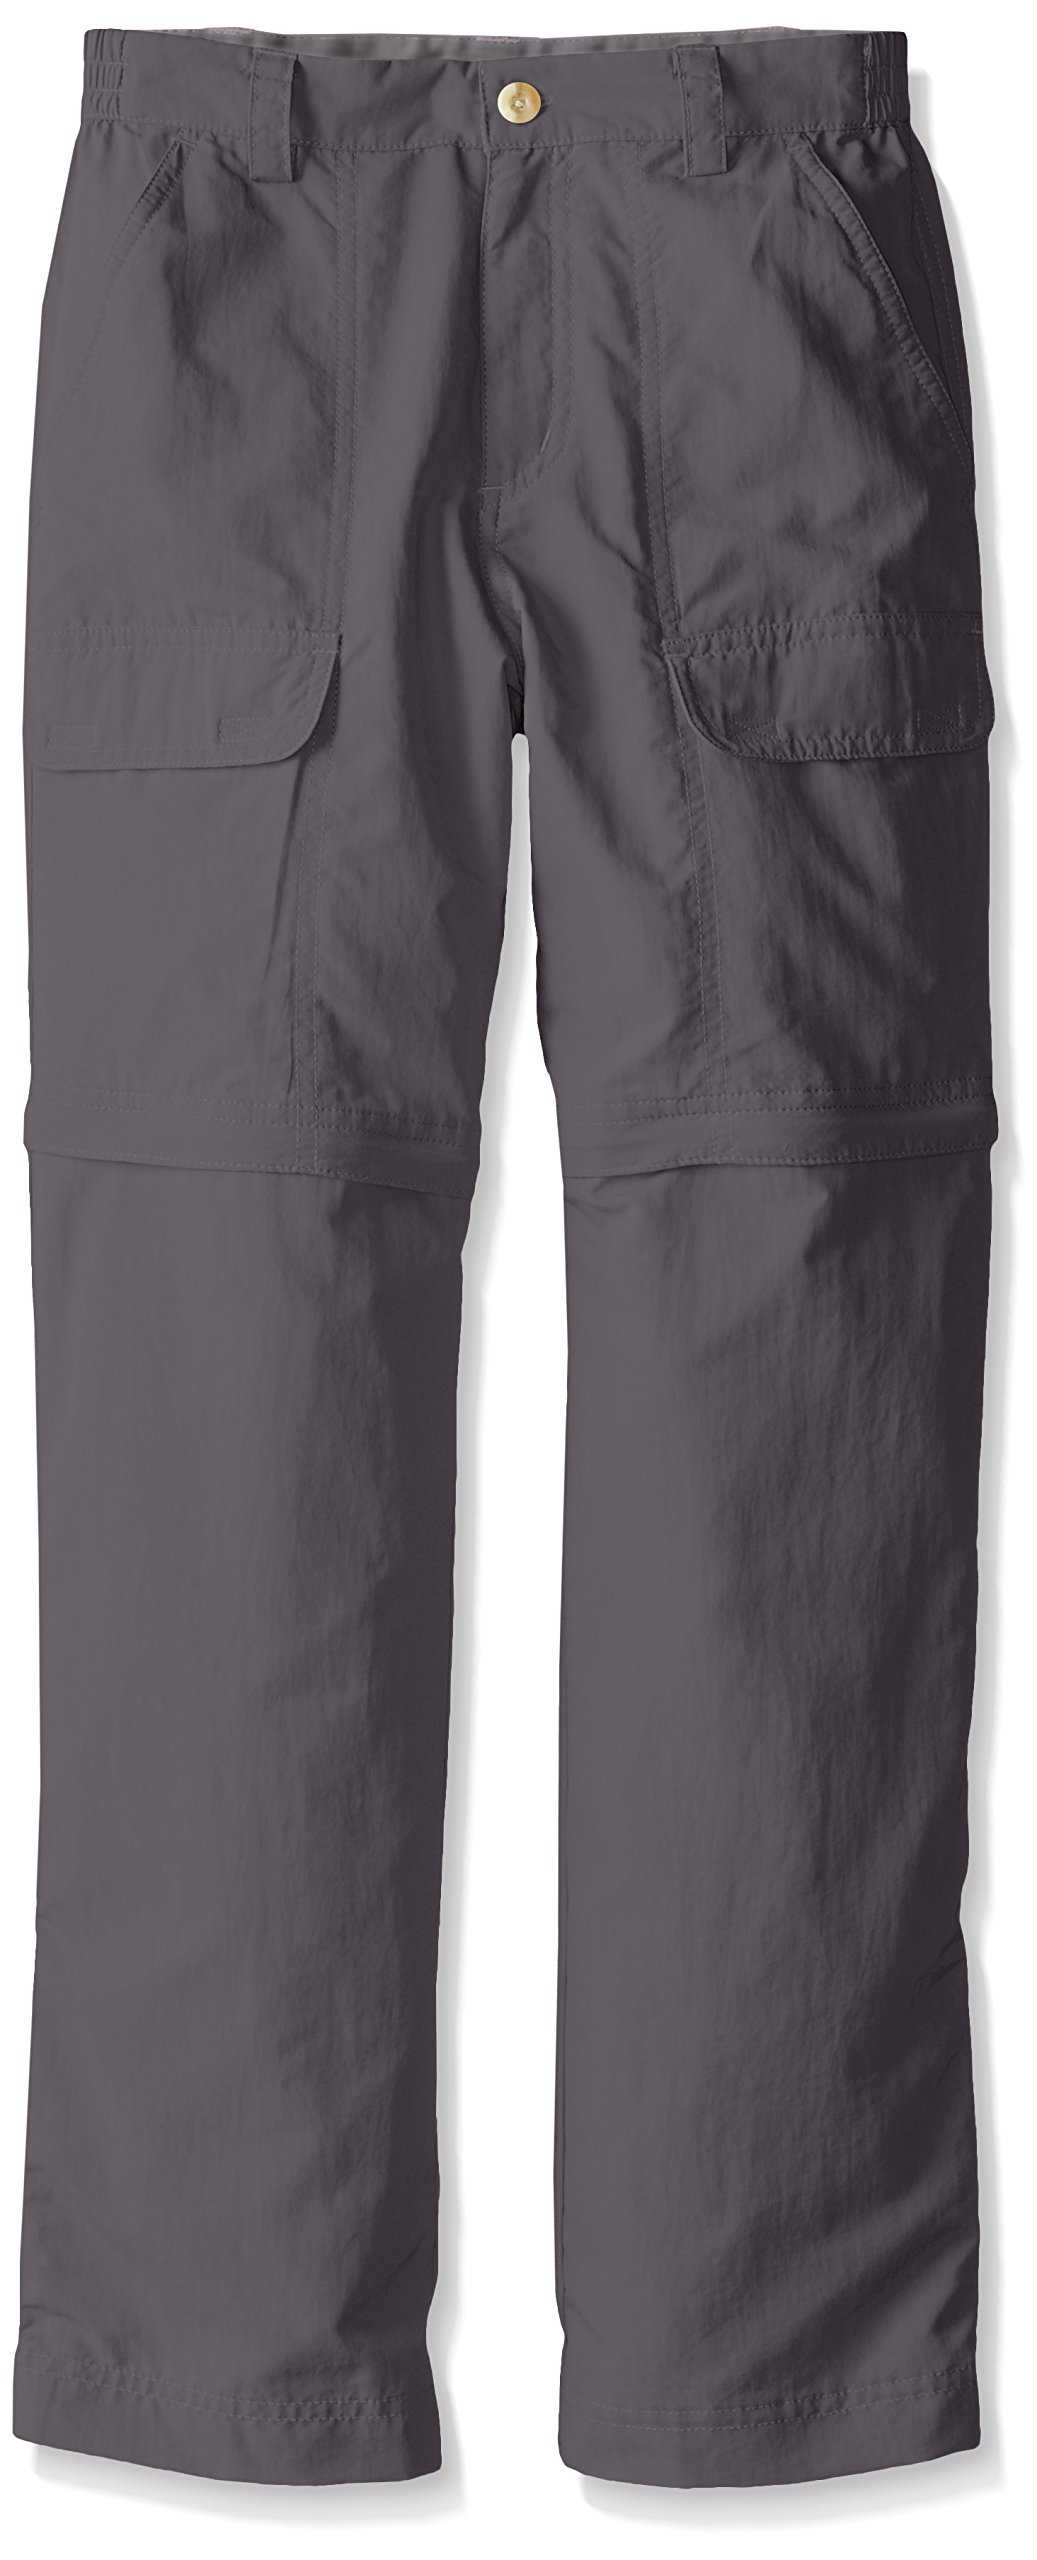 White Sierra Youth Trail Convertible Pants, Castle Rock, Large